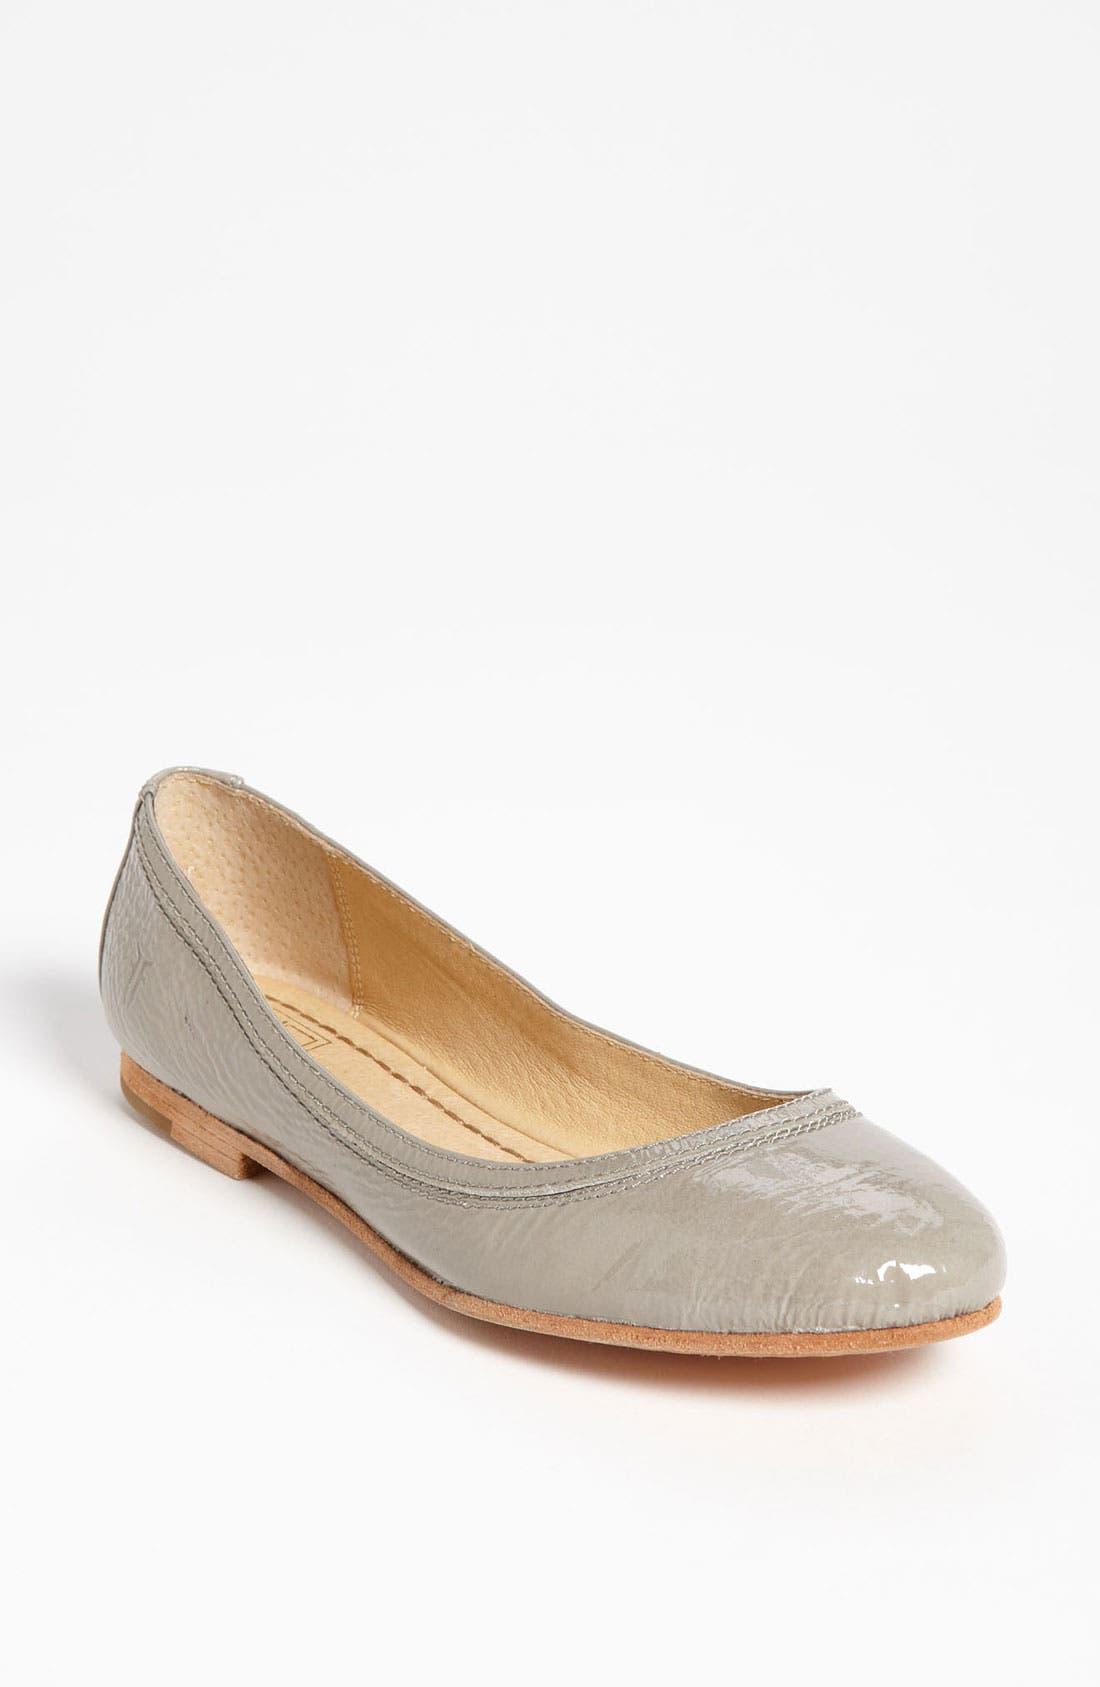 Main Image - Frye 'Carson' Ballet Flat